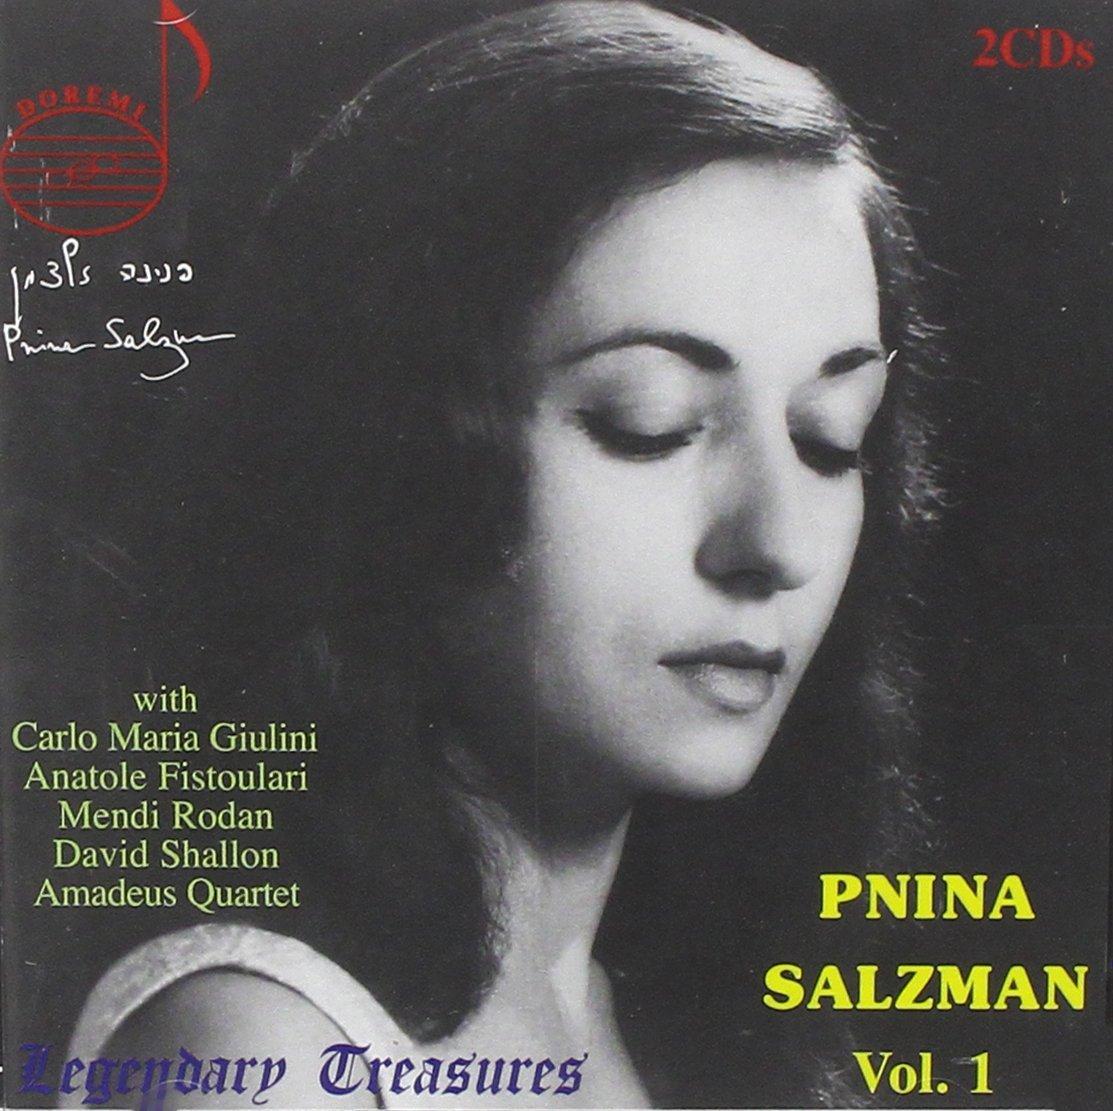 Legendary Treasures: Pnina Salzman 1 by DHR